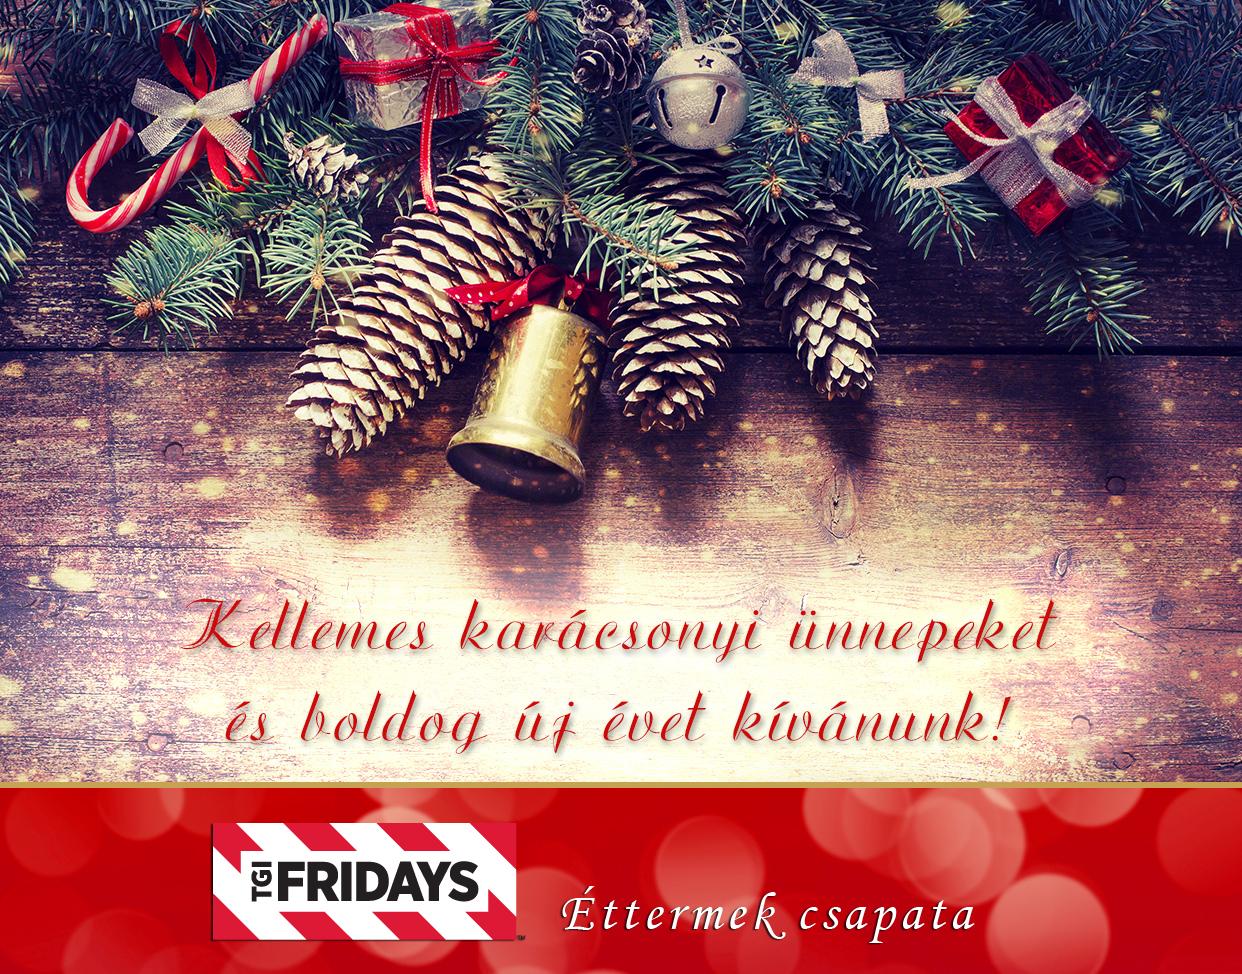 Fridays-holday-greetings